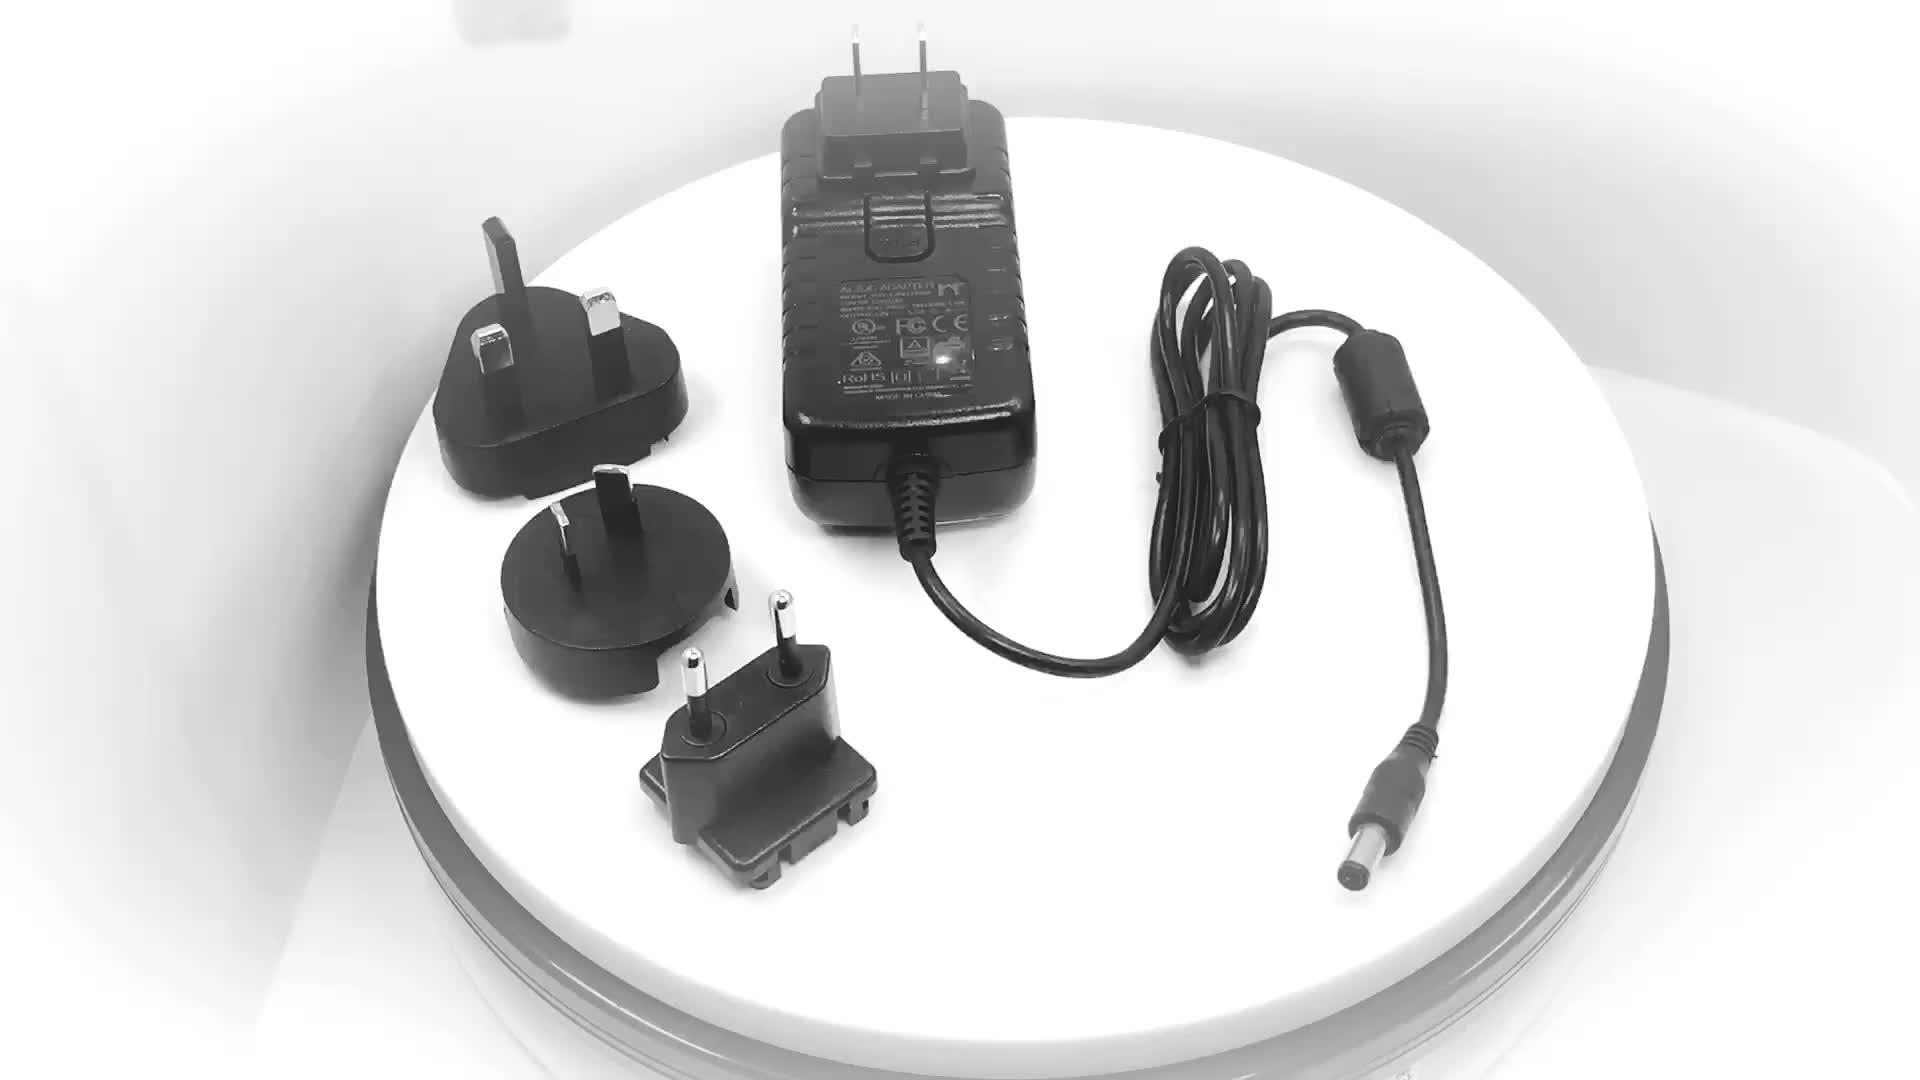 Seviyesi DOE VI SıNıF 2 UL SAA GS C-TICK onaylı ABD İNGILTERE AU AB tak Adaptörü Ac Dc 12 Volt 0.5 Amp 6 w 12 v 0.5a Ac/dc Güç Adaptörü